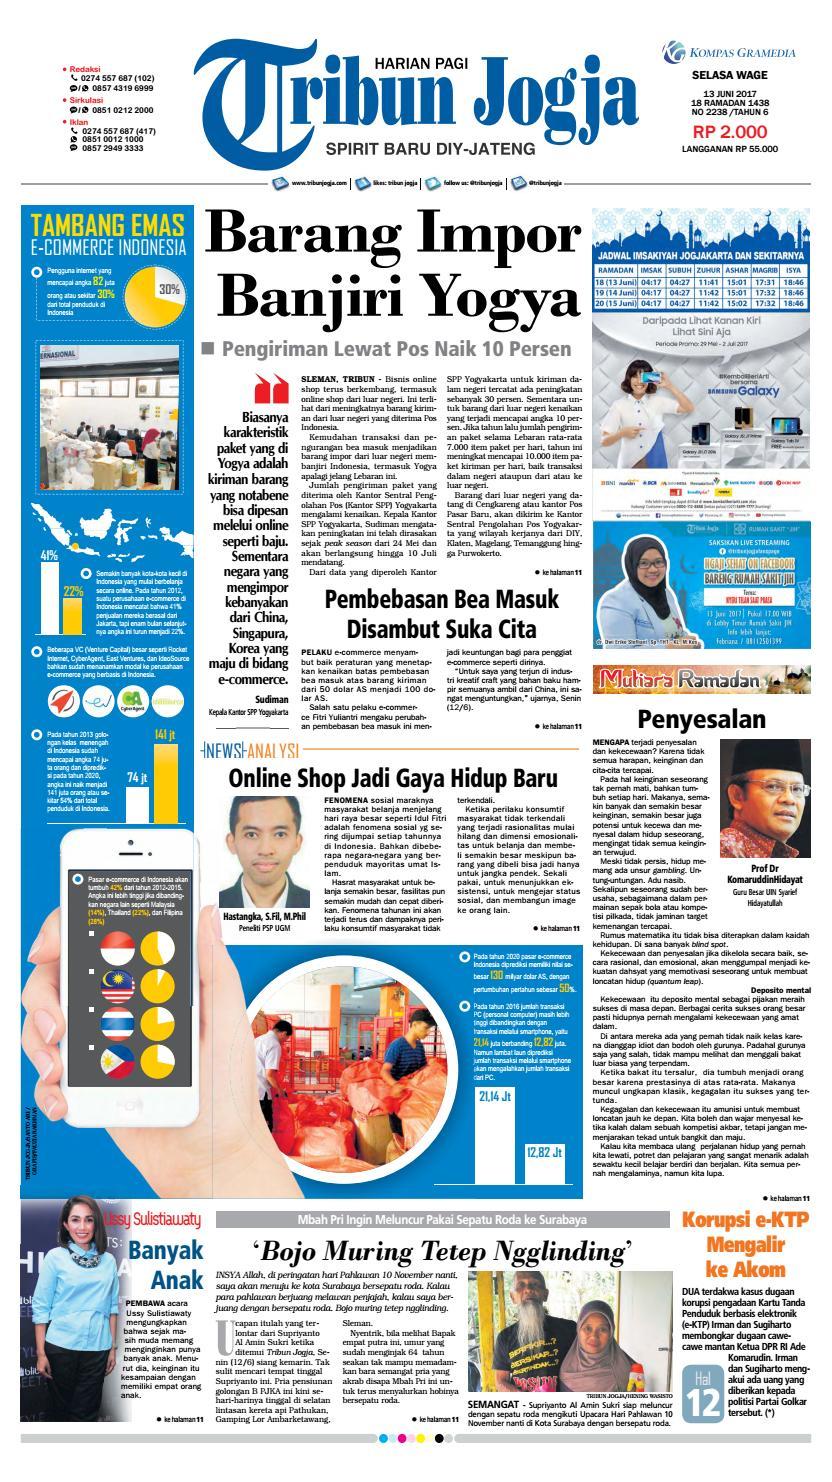 Tribunjogja 13 06 2017 By Tribun Jogja Issuu Rkb Bni Tegal Kranjang Buah Nur Fashion And Art